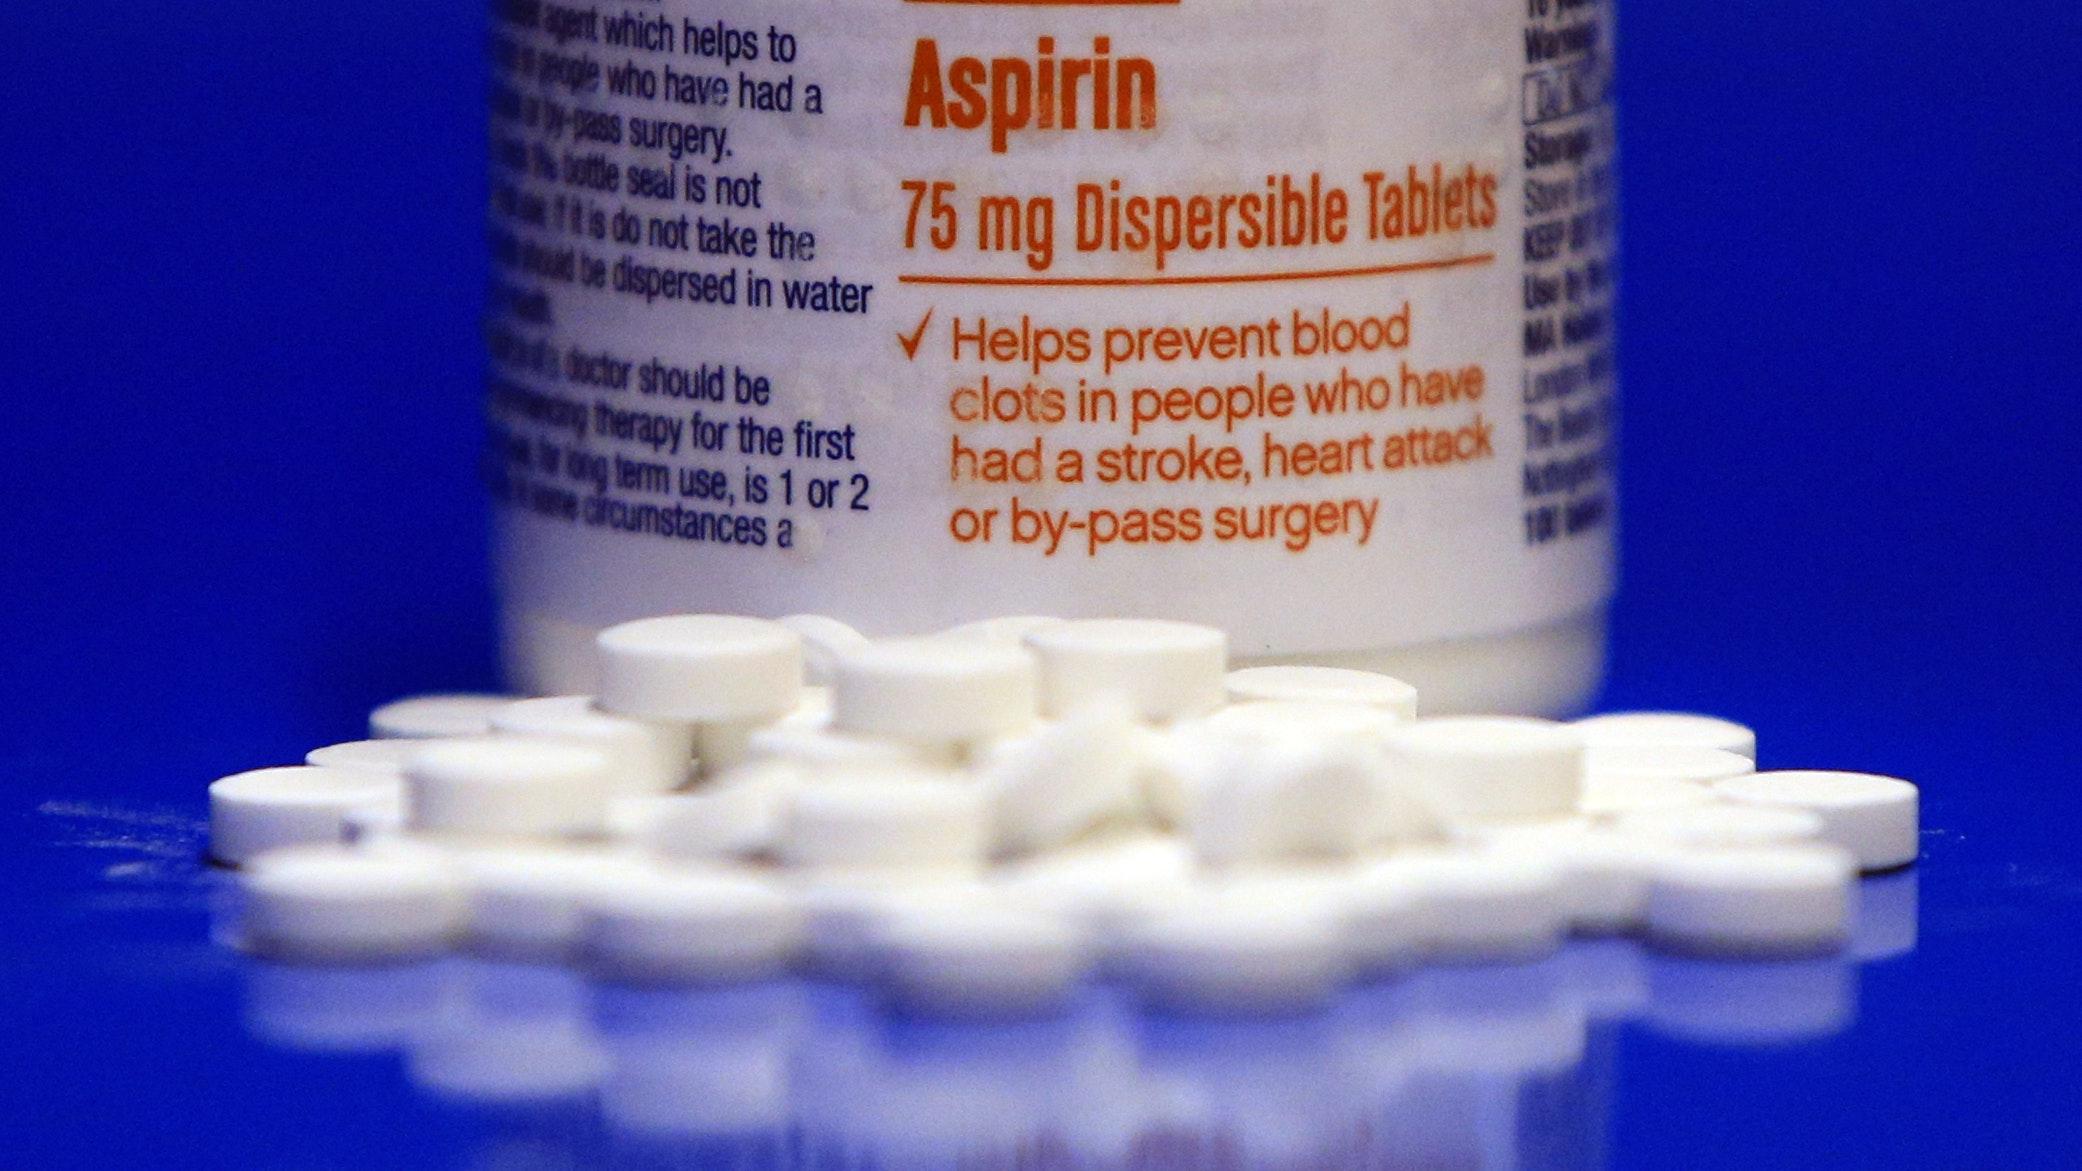 Ovarian cancer: Aspirin could reduce risk